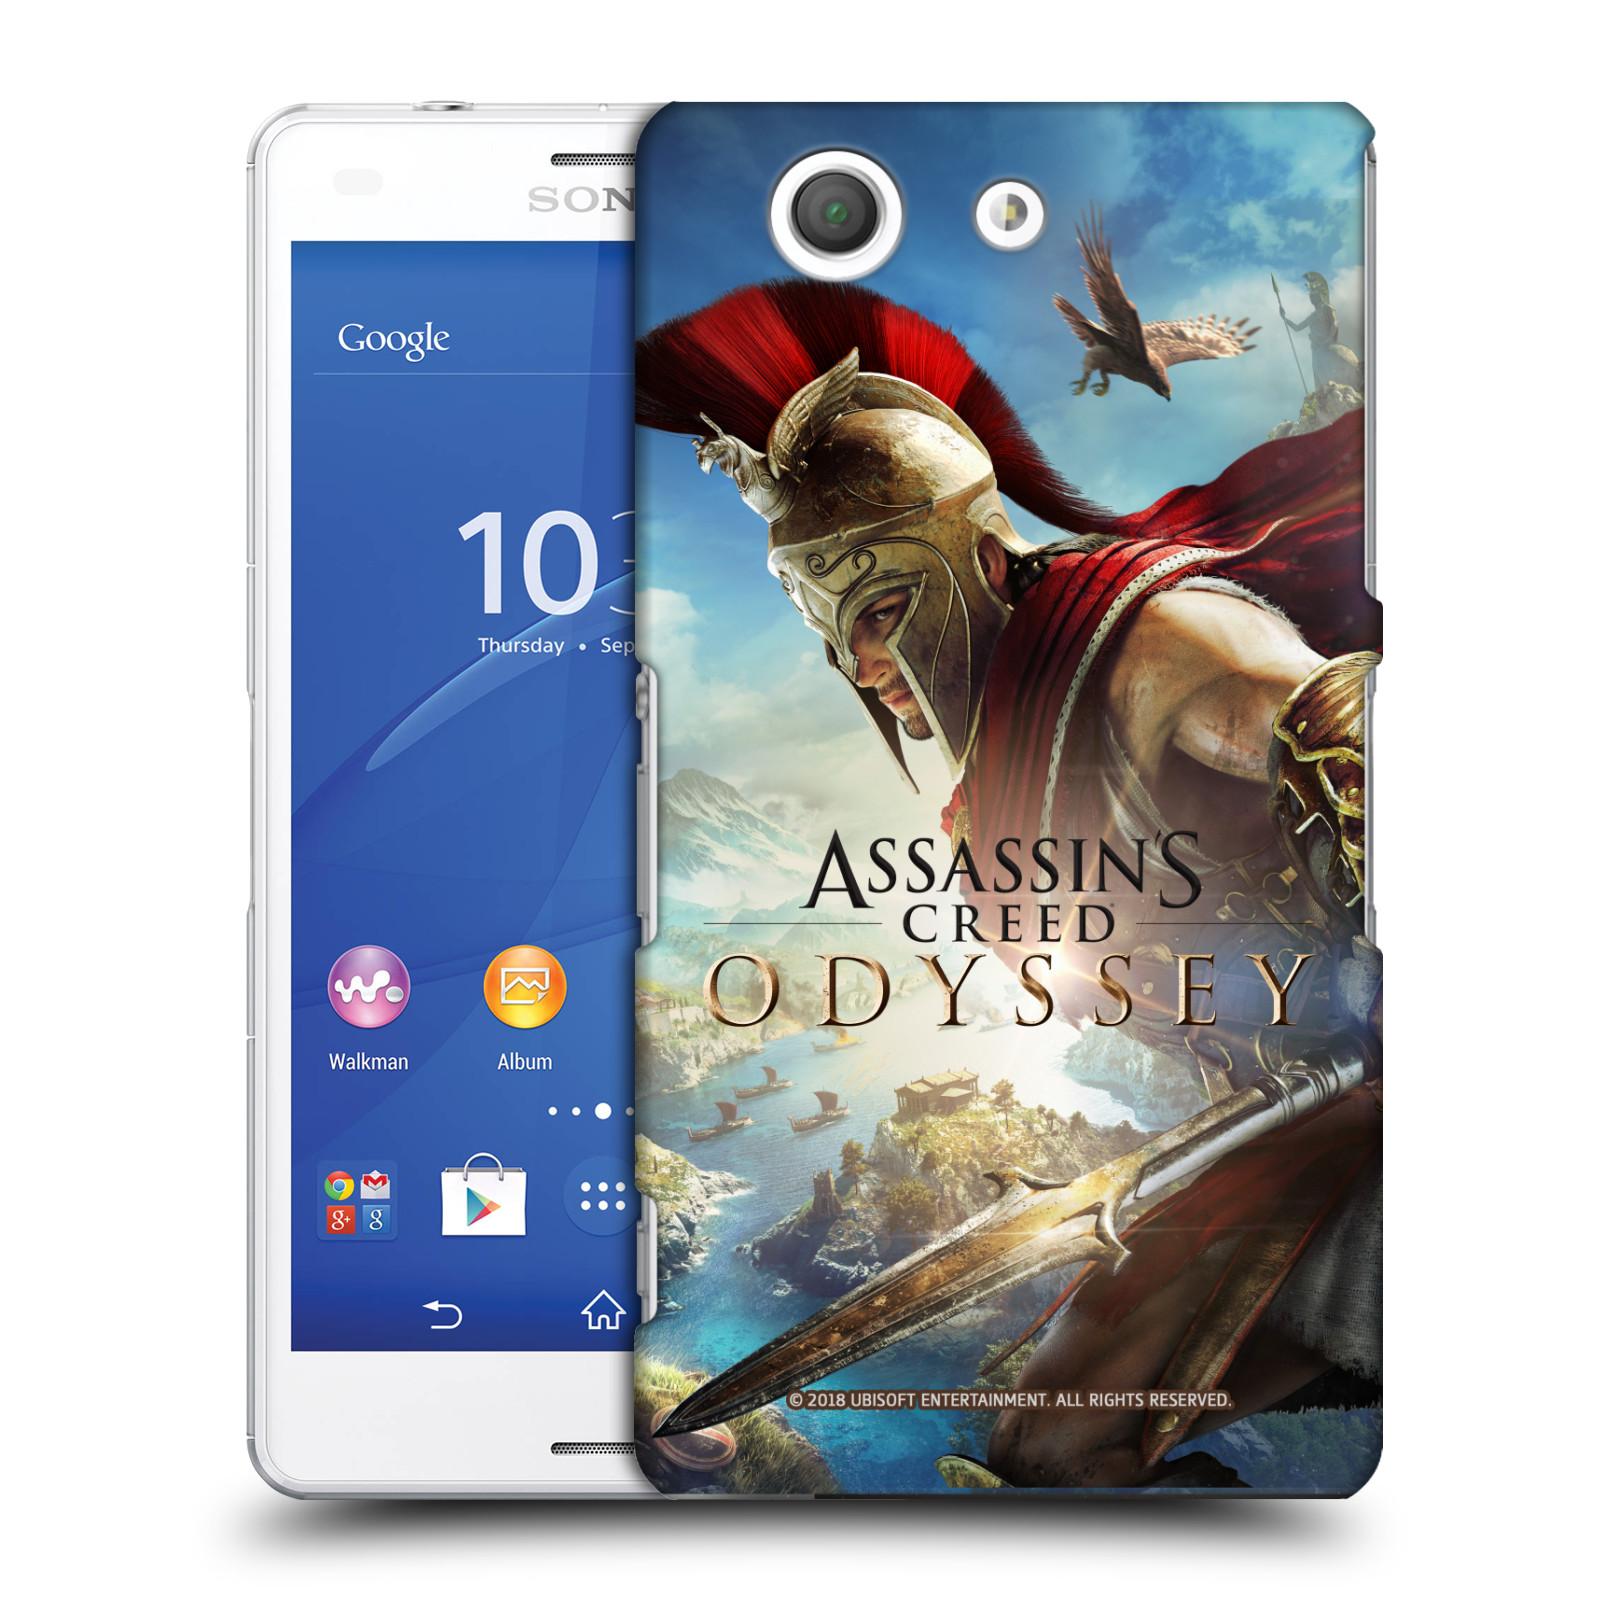 Pouzdro na mobil Sony Xperia Z3 COMPACT - HEAD CASE - Assassins Creed Odyssey Alexios a Ikaros